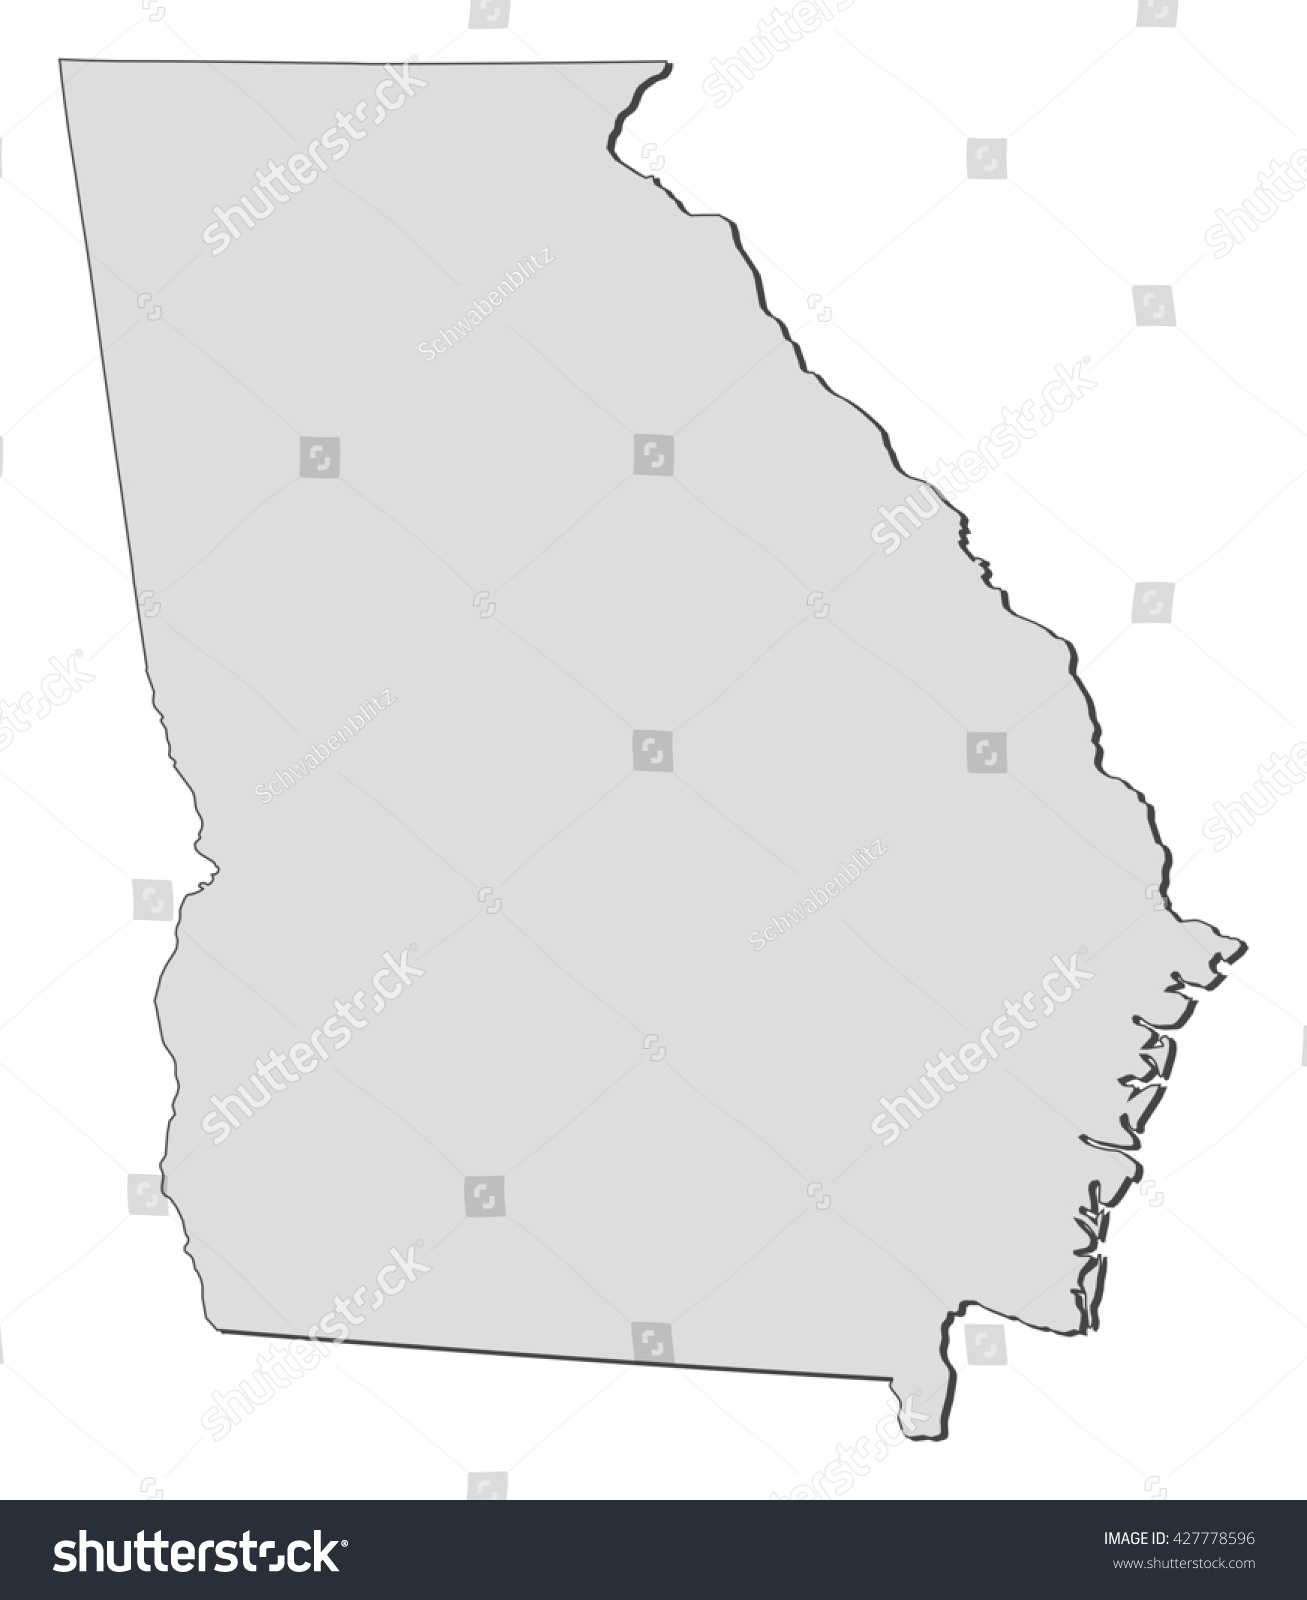 Map Georgia United States Stock Vector Shutterstock - Map of georgia united states